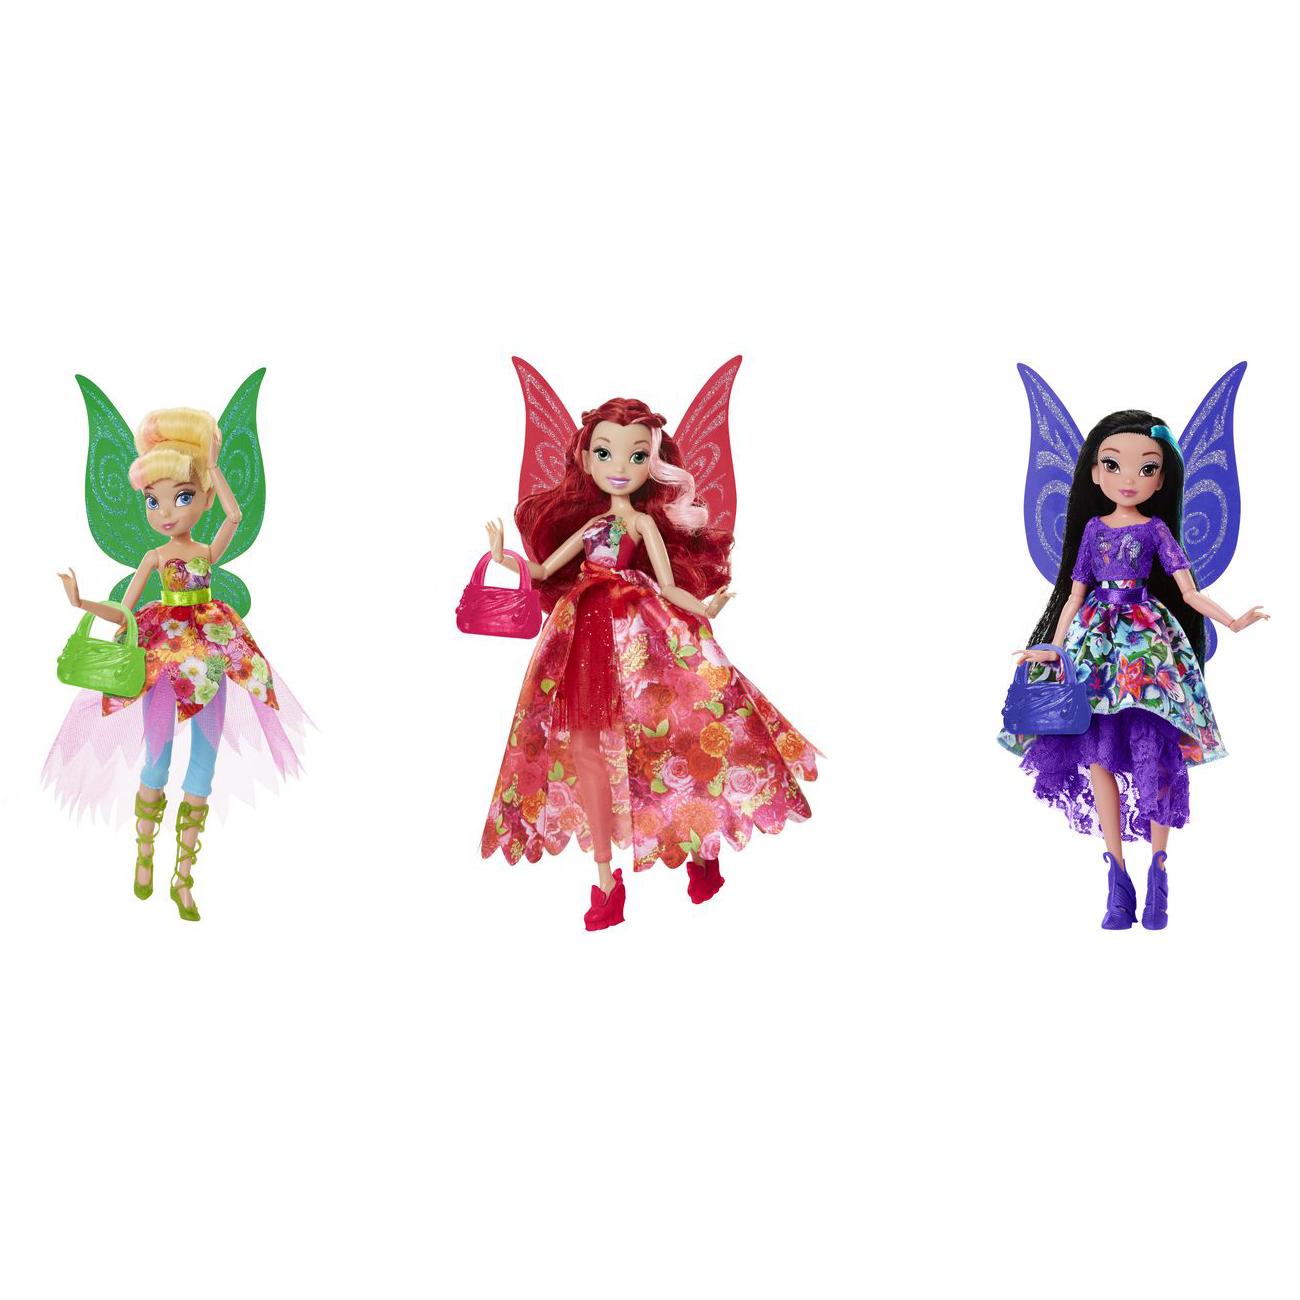 Куклы Дисней - Фея Делюкс с сумочкой, 23 см.Феи<br>Куклы Дисней - Фея Делюкс с сумочкой, 23 см.<br>